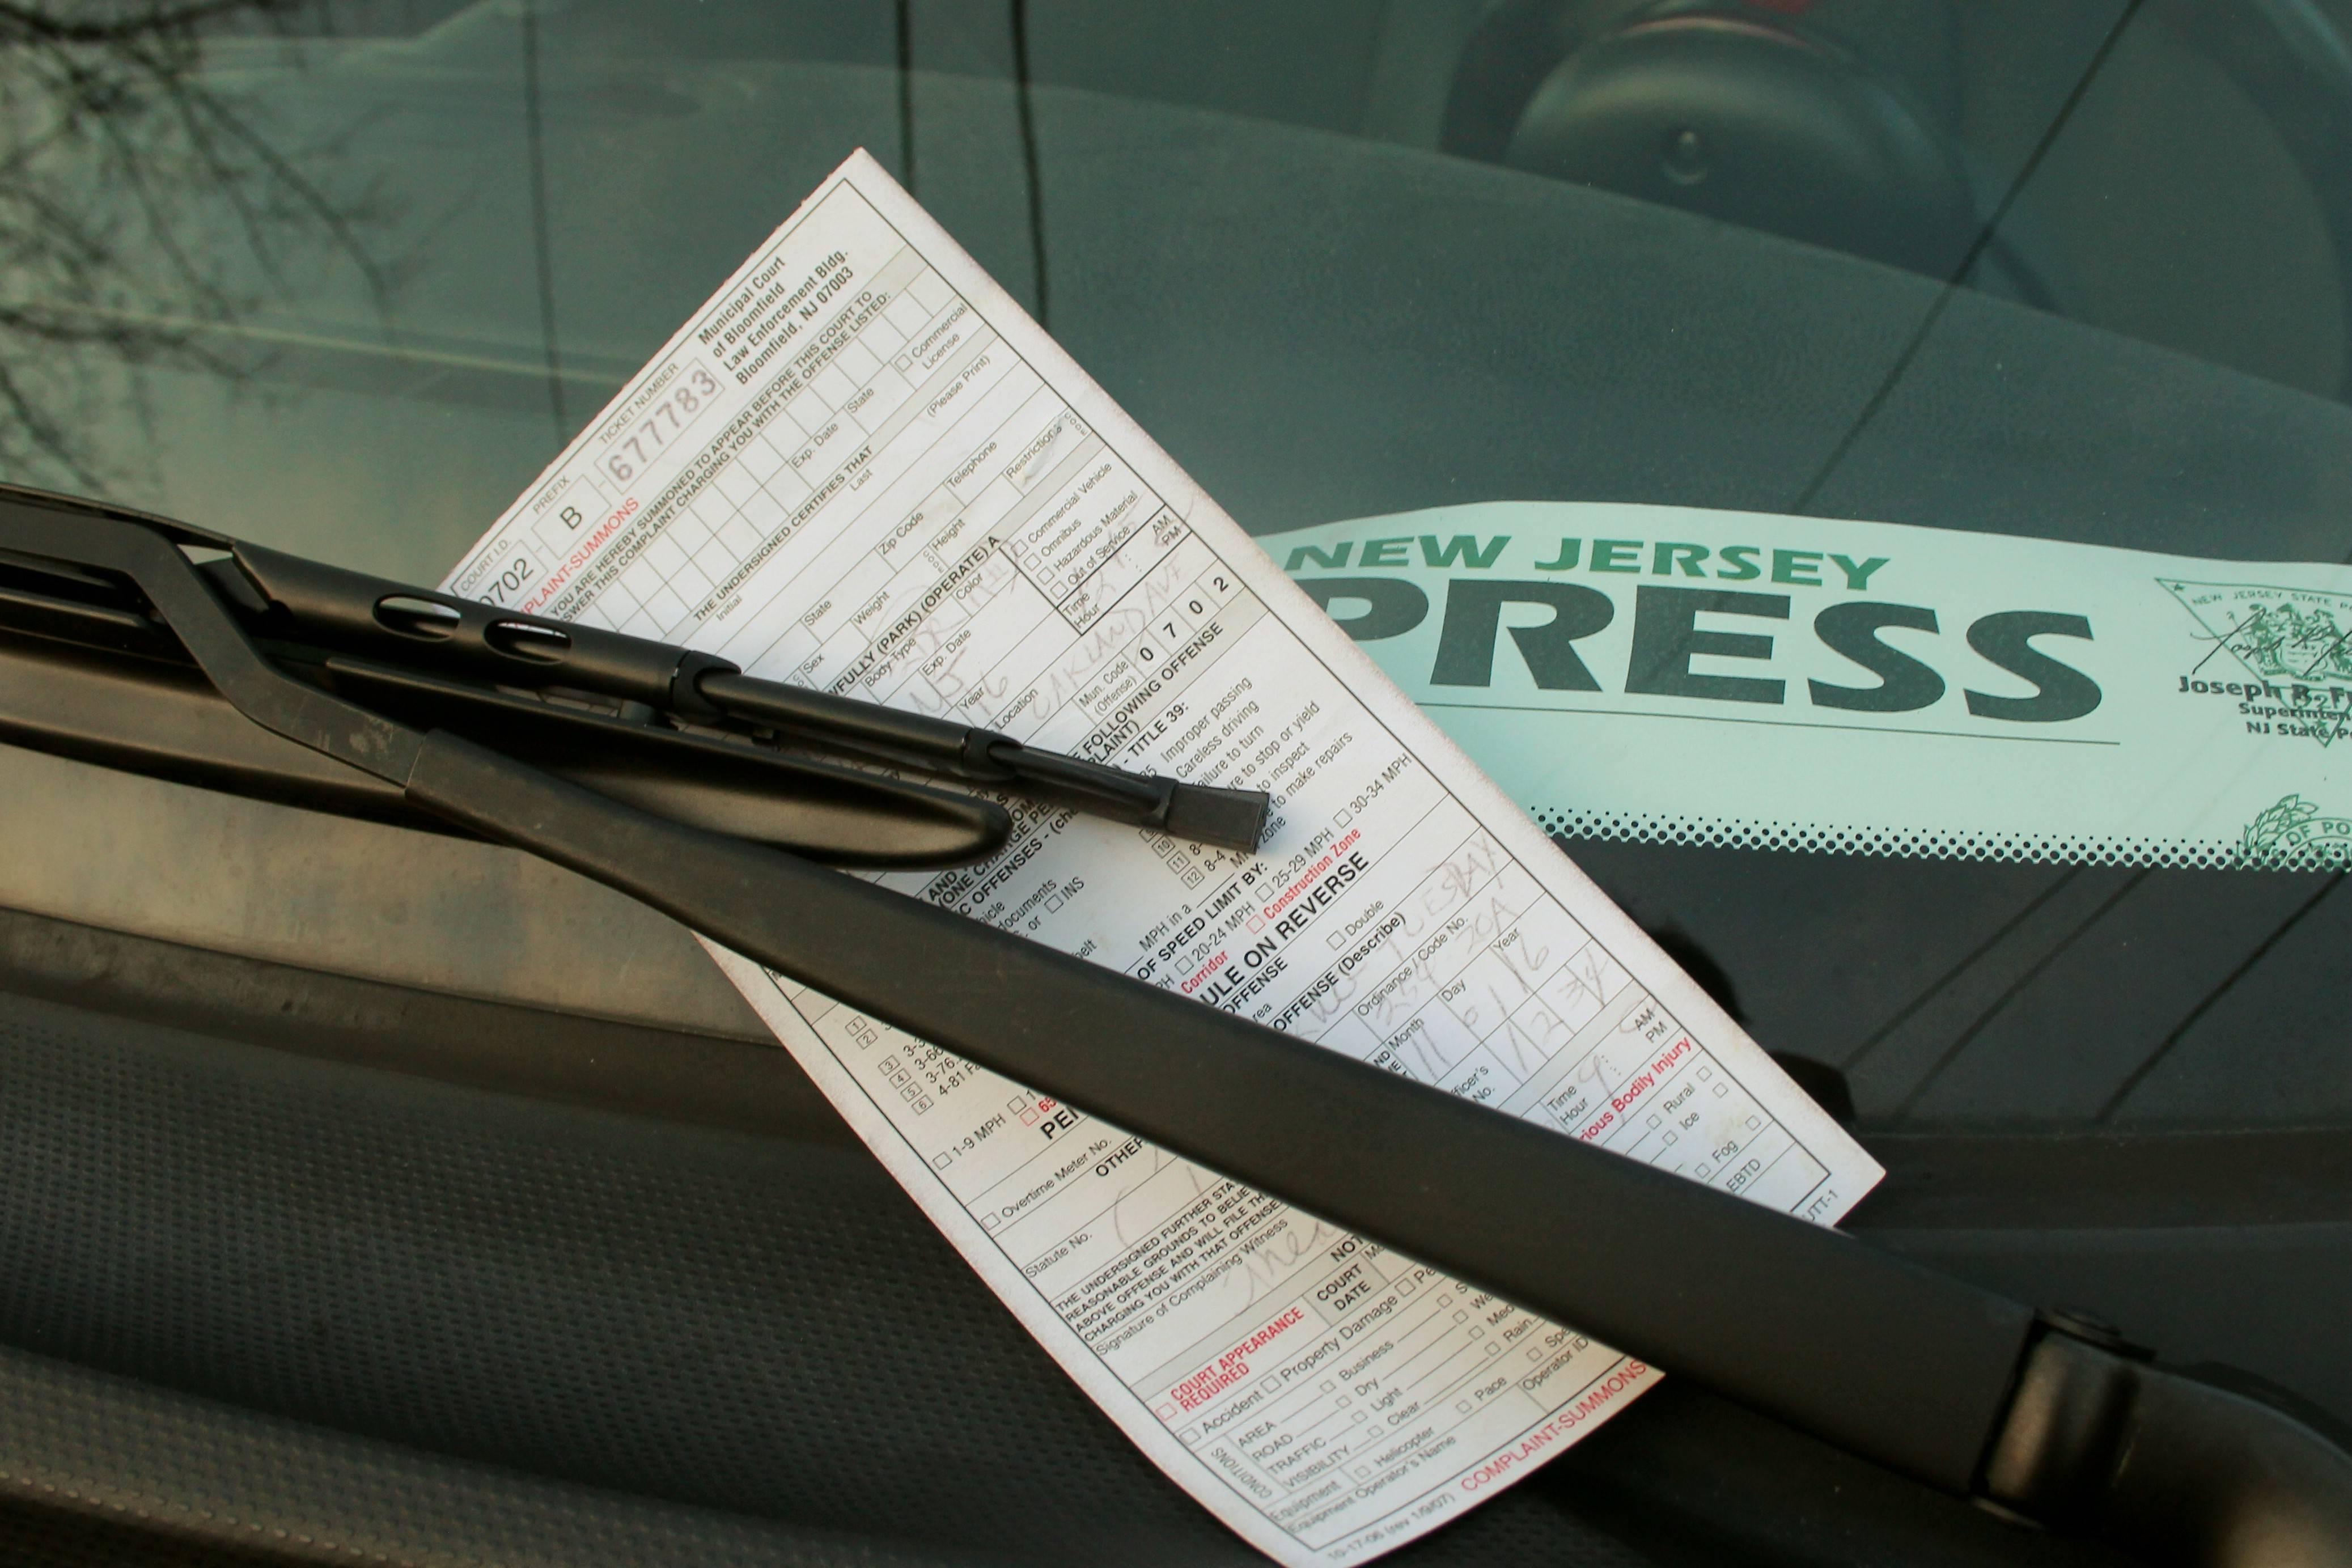 ce8495ba4e16e664145e_Parking_Ticket_Jan_2017.jpg